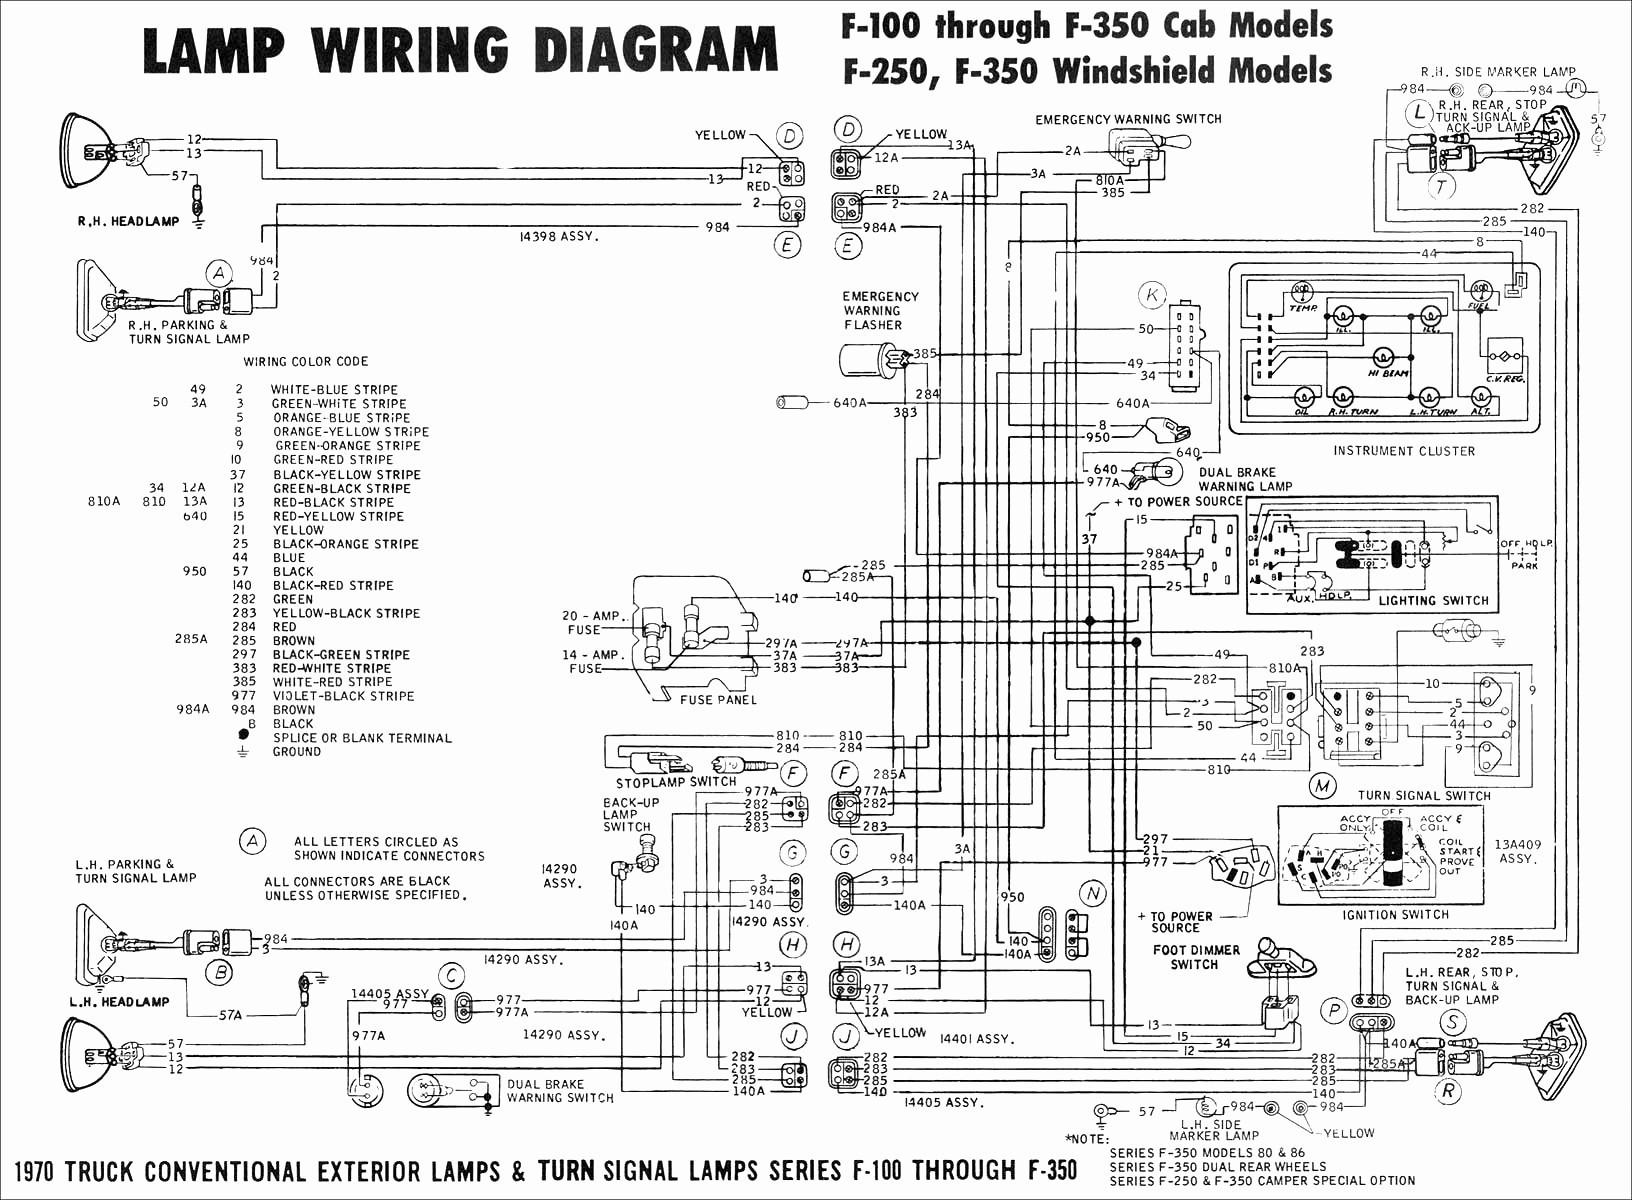 2004 ford Freestar Engine Diagram 2006 ford E250 Wiring Diagram Wiring Diagram toolbox Of 2004 ford Freestar Engine Diagram